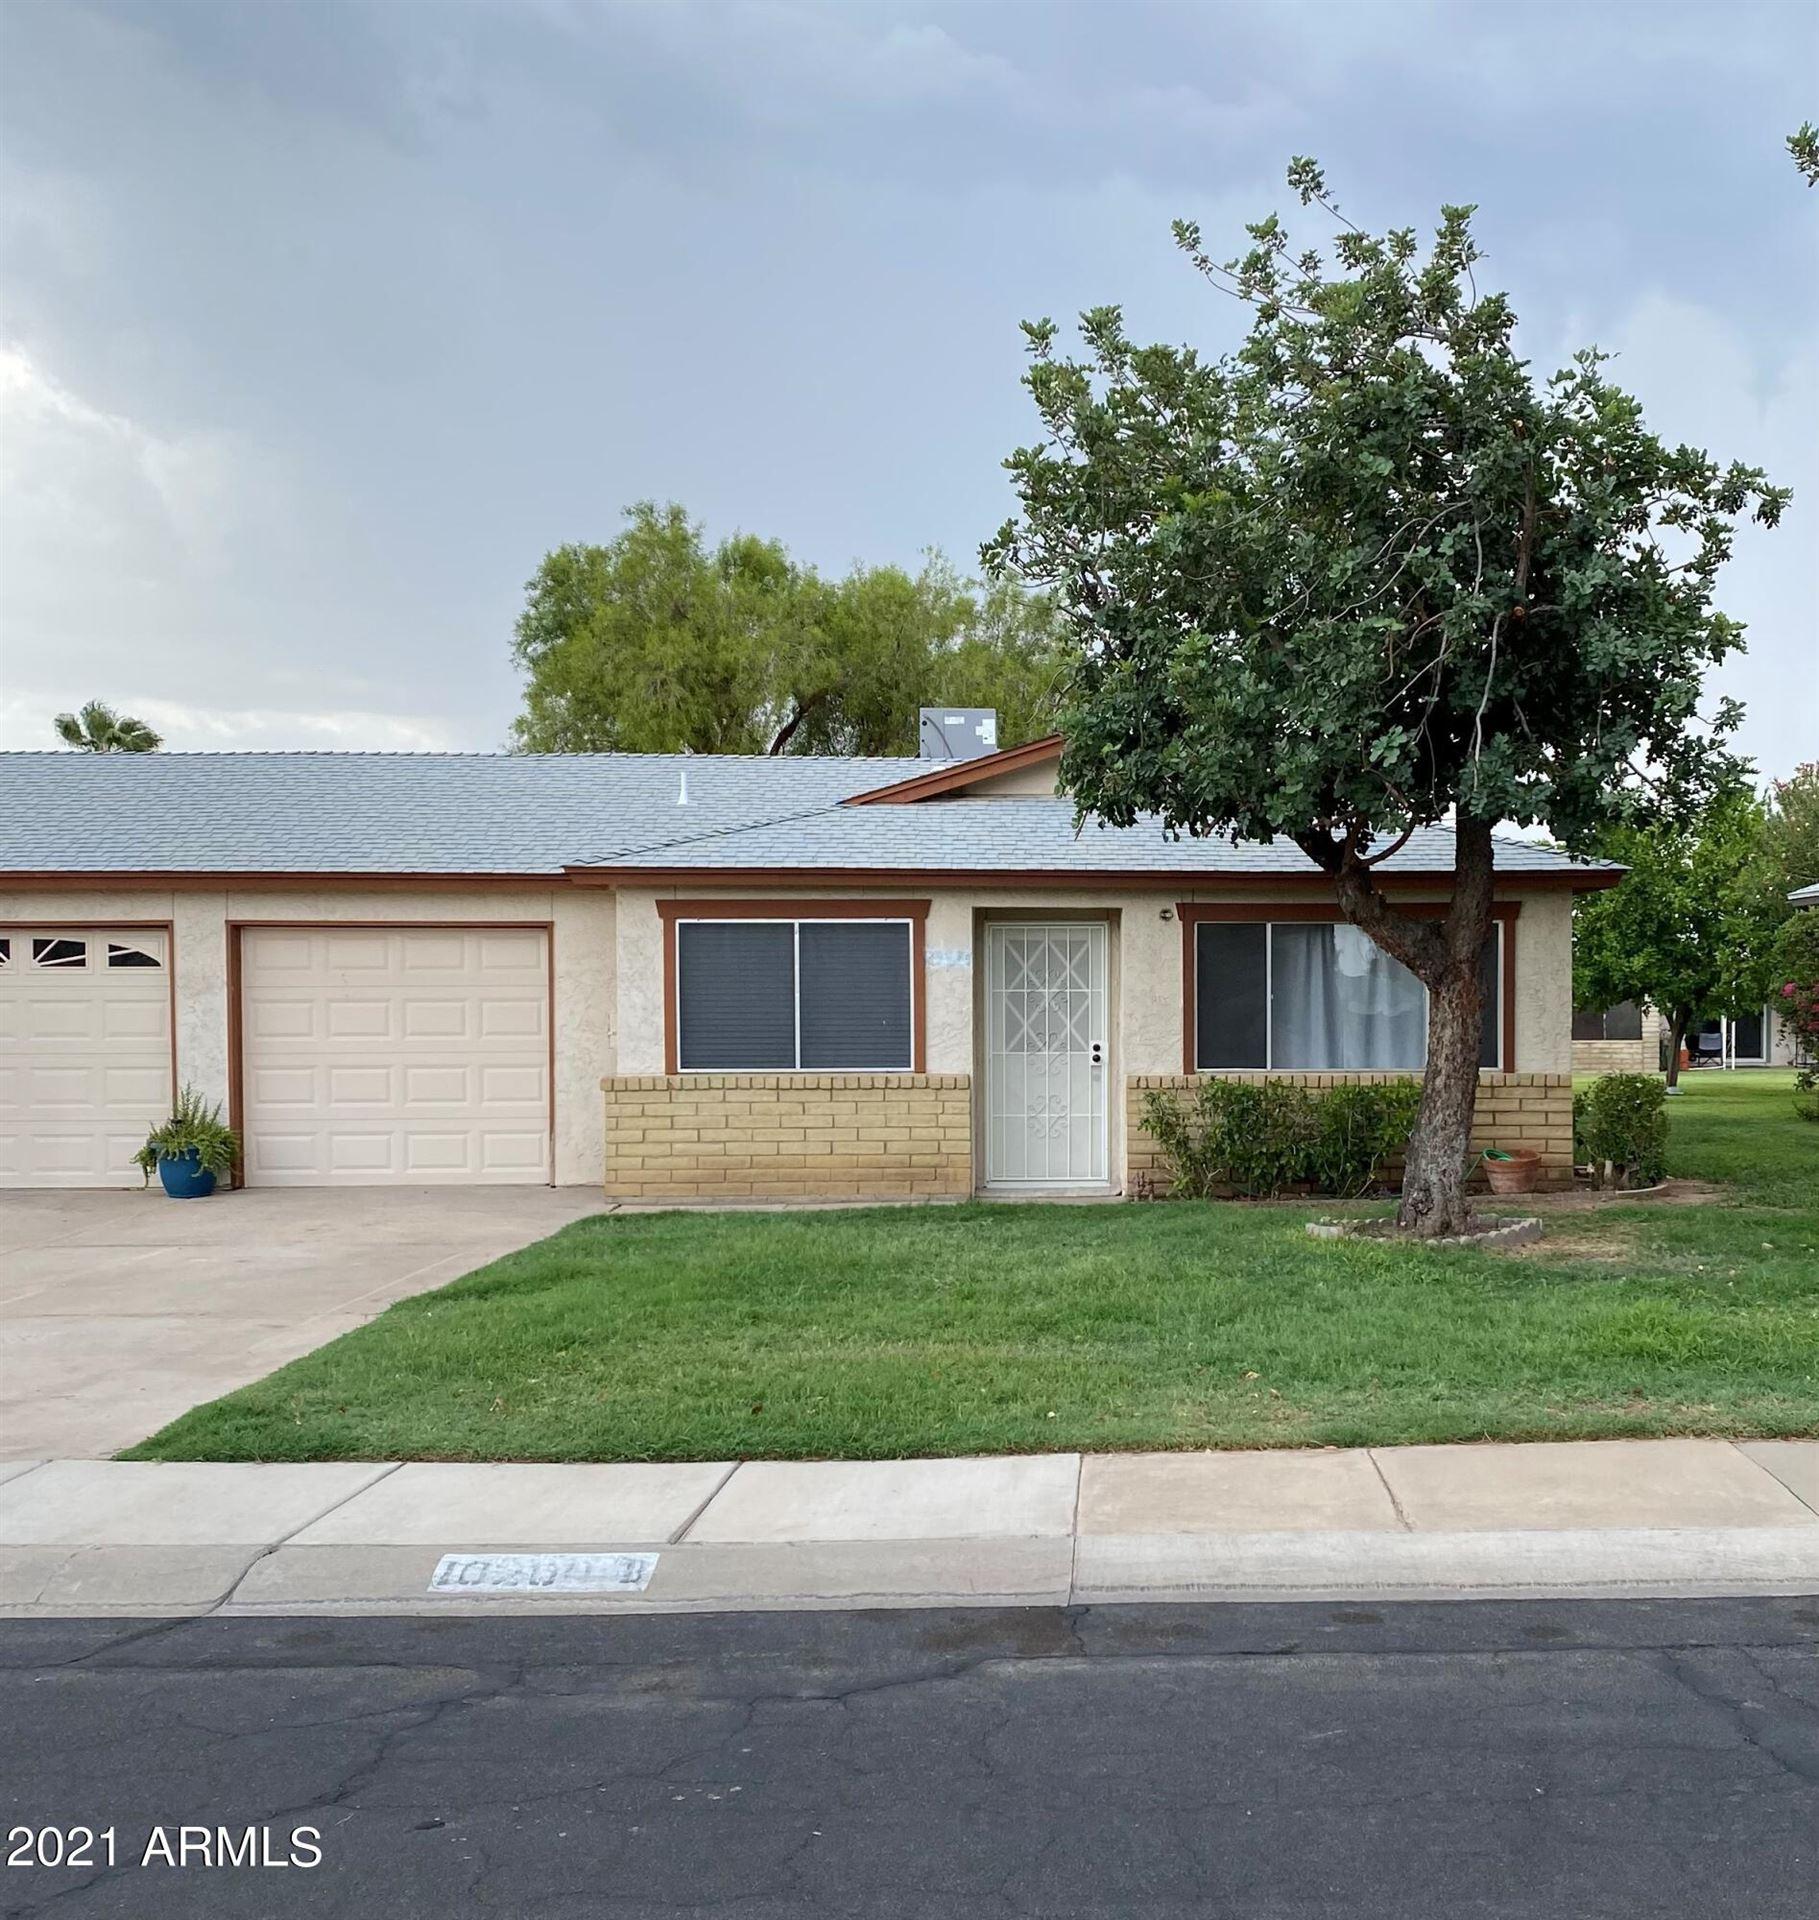 10200 N 97TH Avenue #B, Peoria, AZ 85345 - MLS#: 6267132